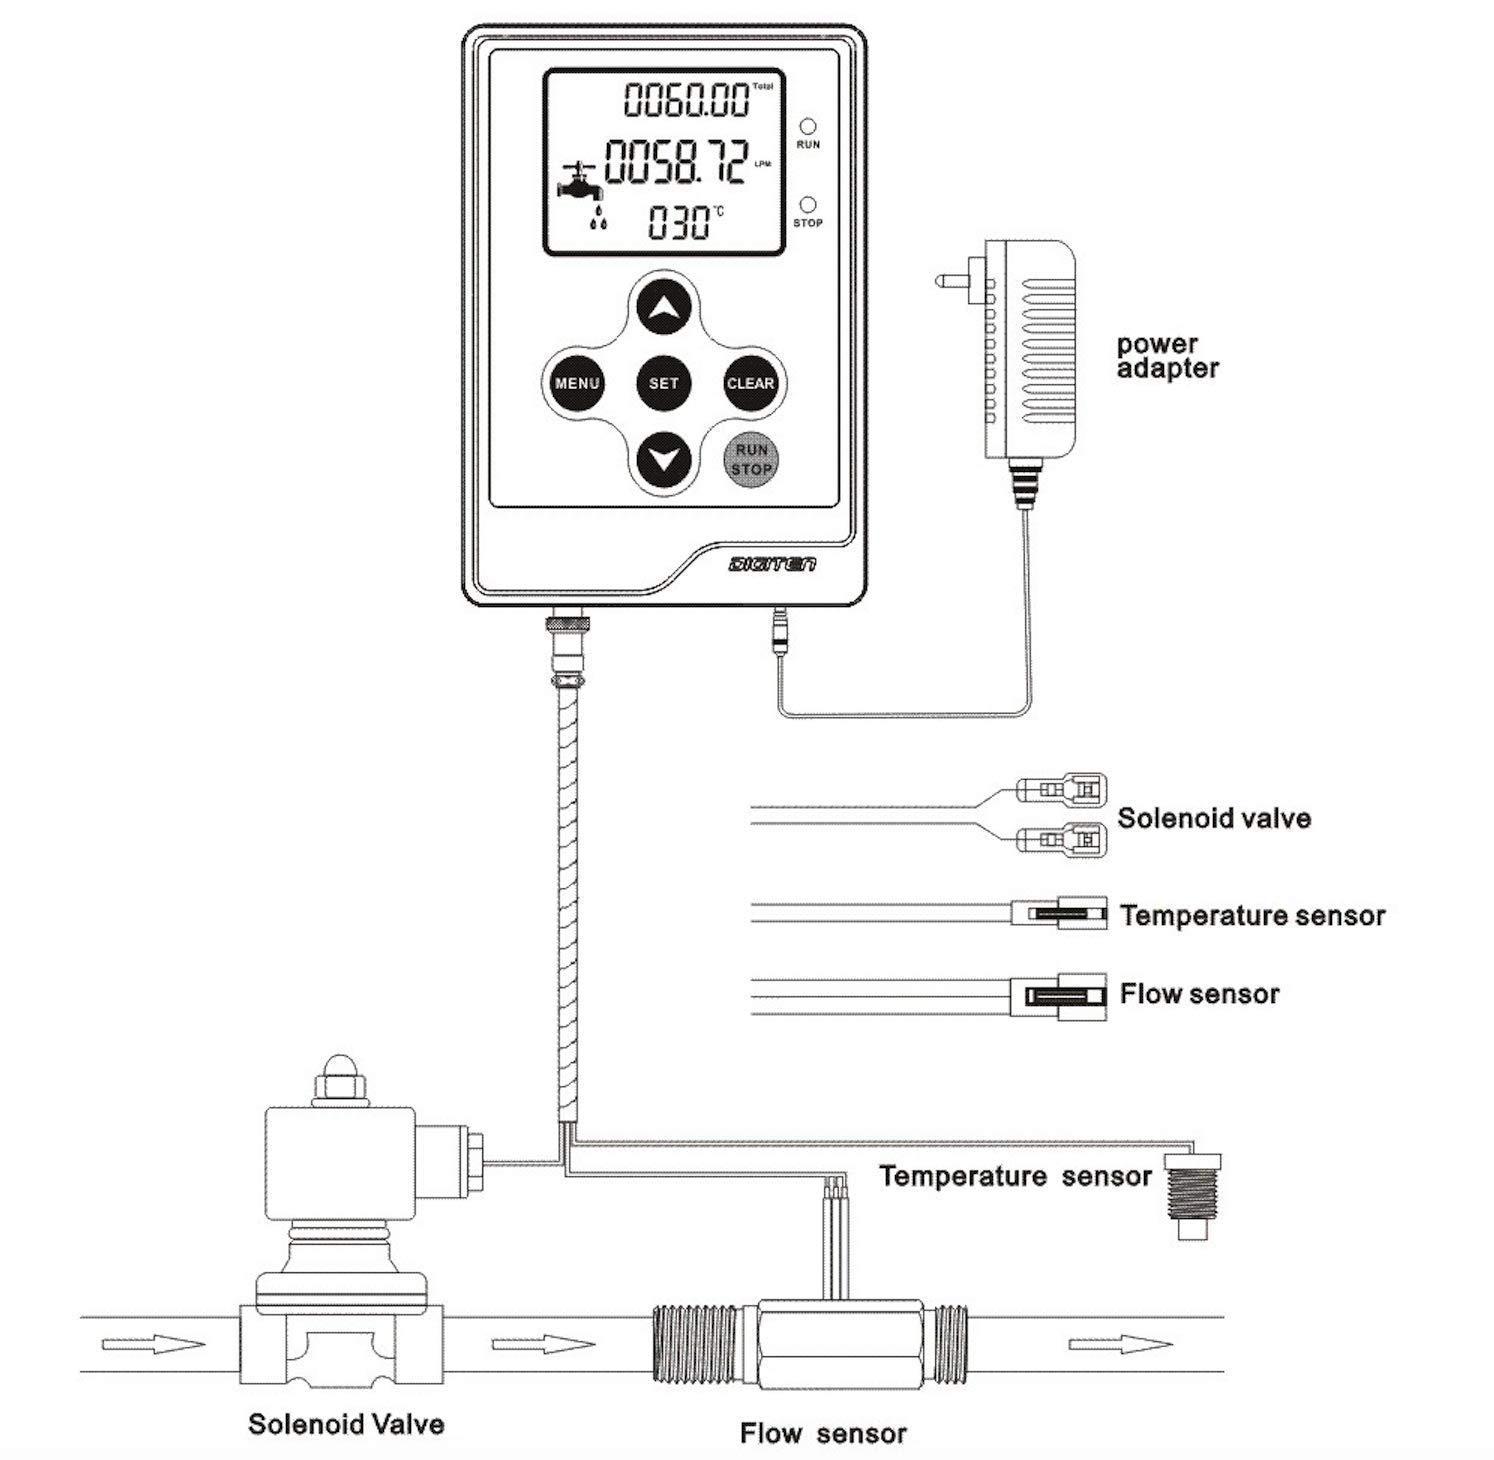 DIGITEN LCD Display Water Flow Control Meter Liquid Quantitative Controller + G2'' 2 inch Water Flow Hall Sensor Switch Meter Flowmeter Control 10-200L/min + DC 12V Power Adapter by DIGITEN